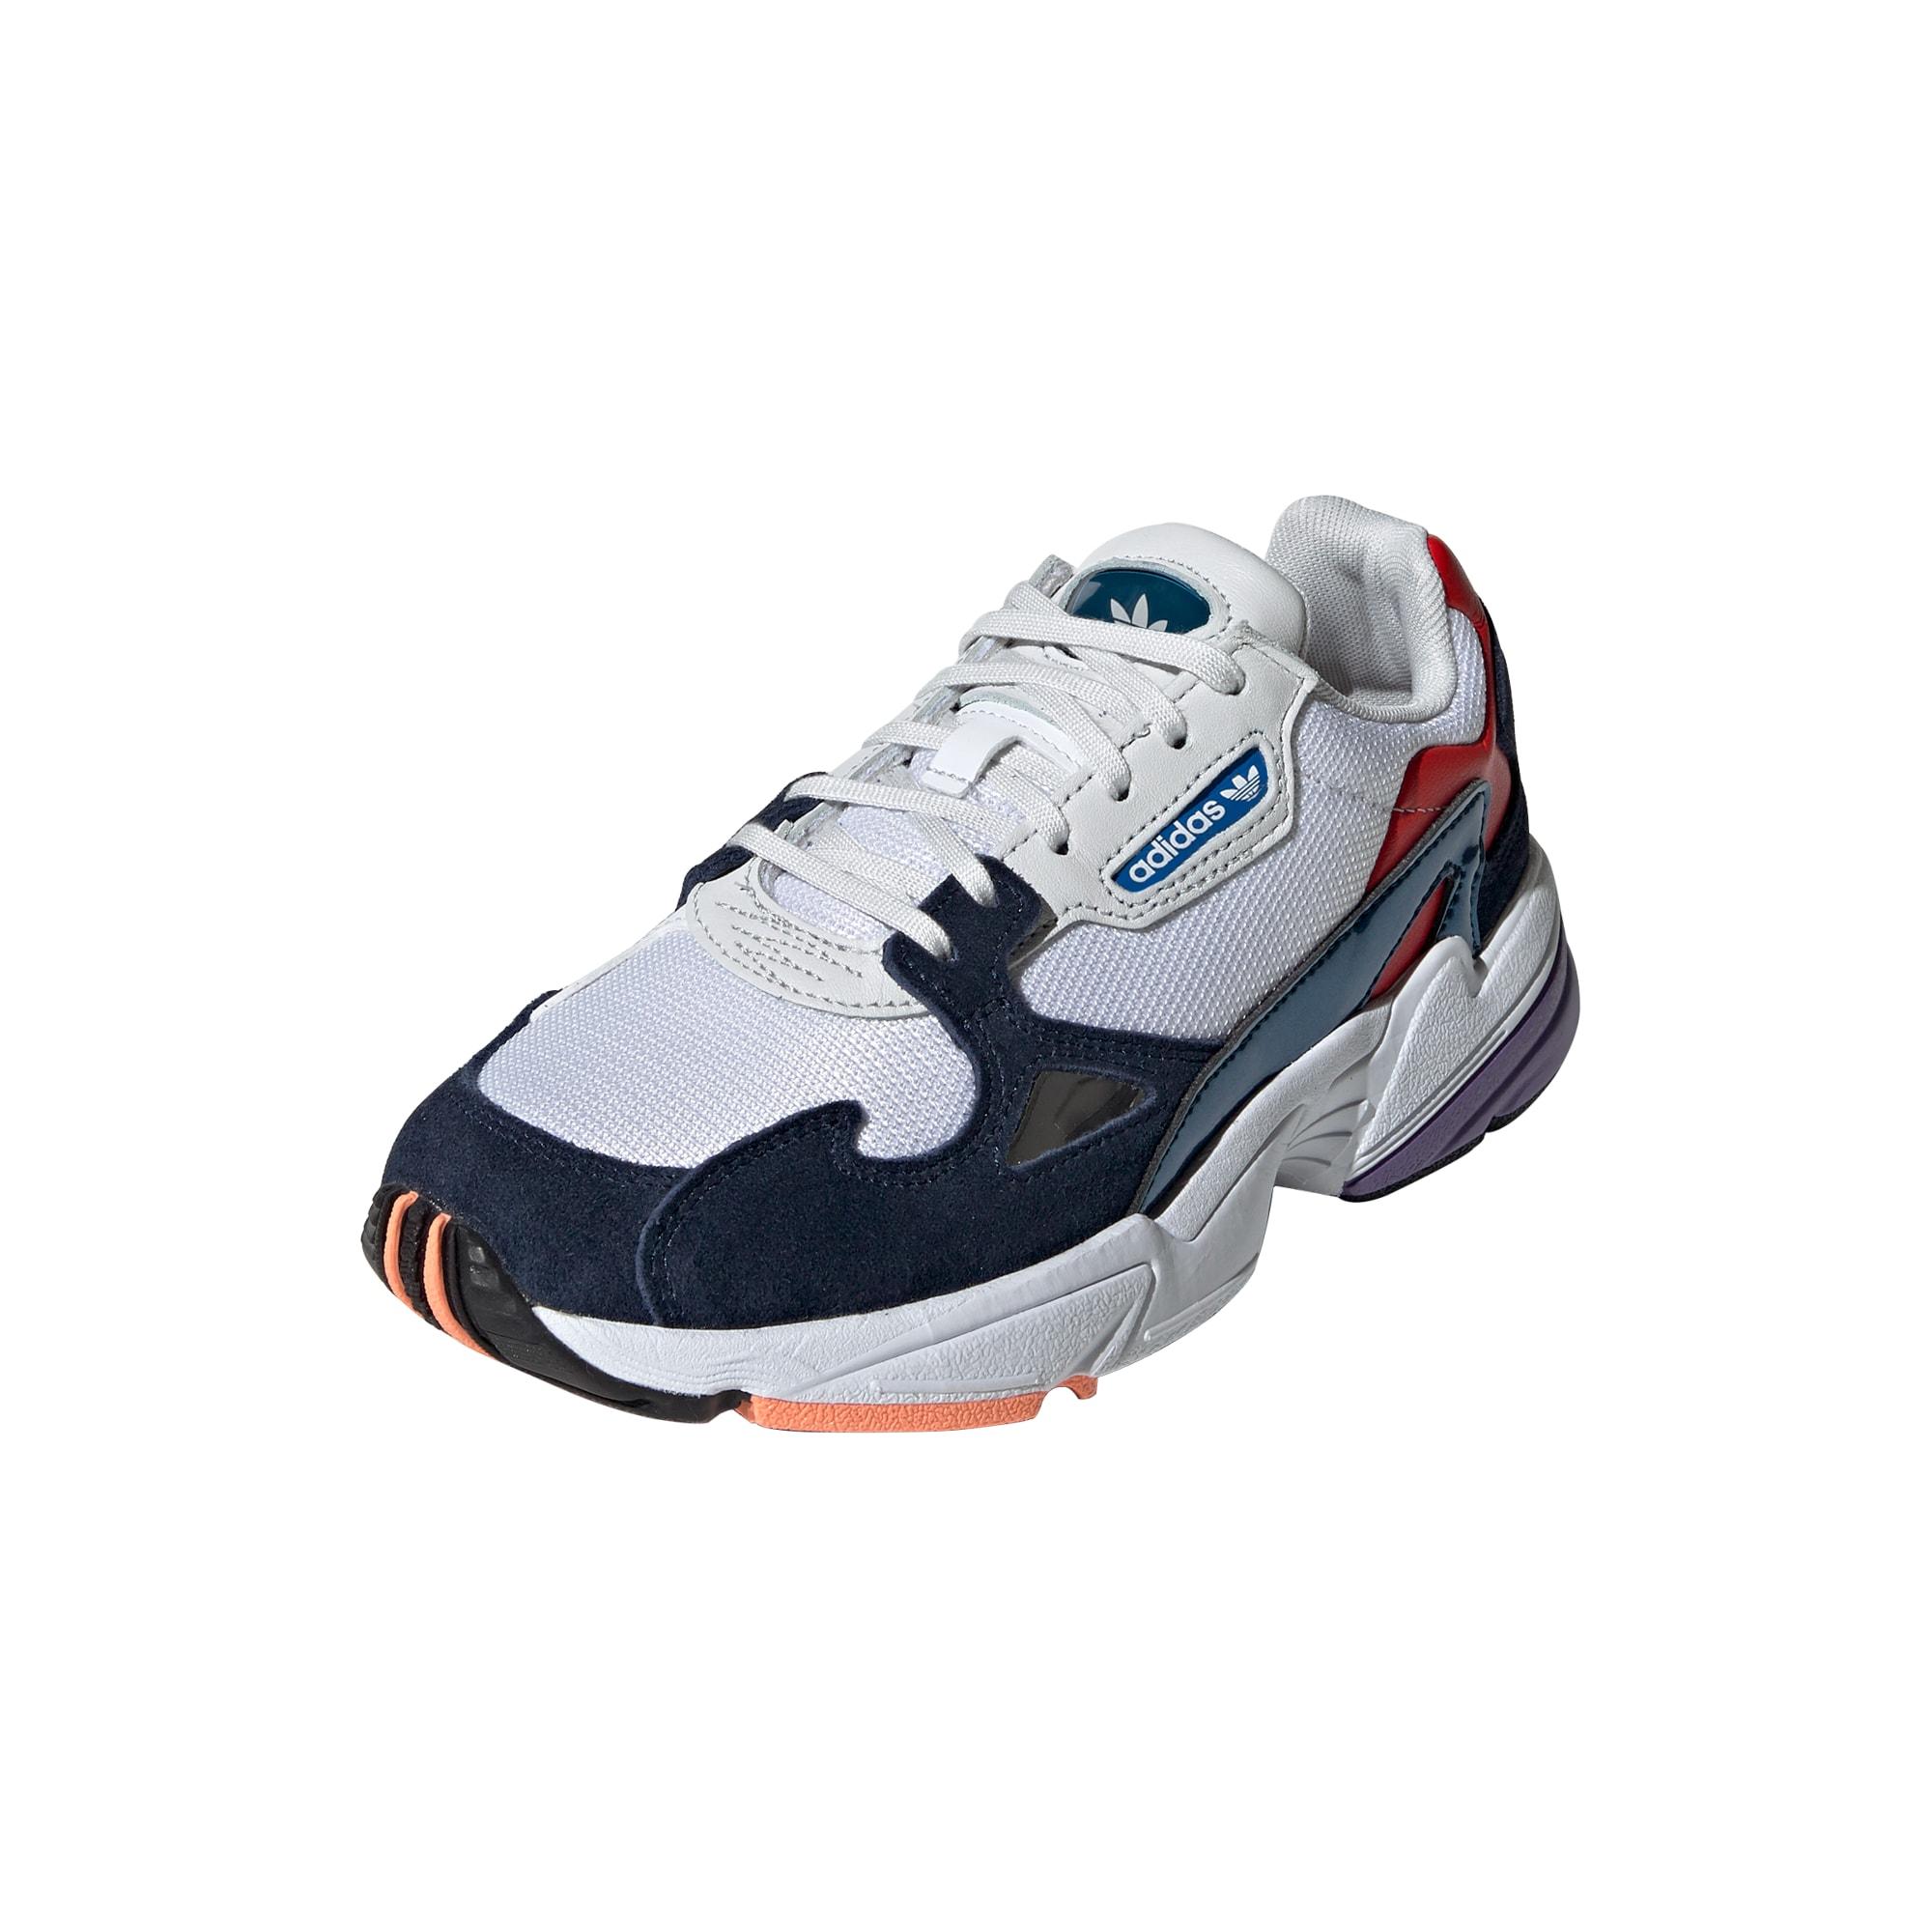 ADIDAS ORIGINALS, Dames Sneakers laag 'Falcon', rood / zwart / wit